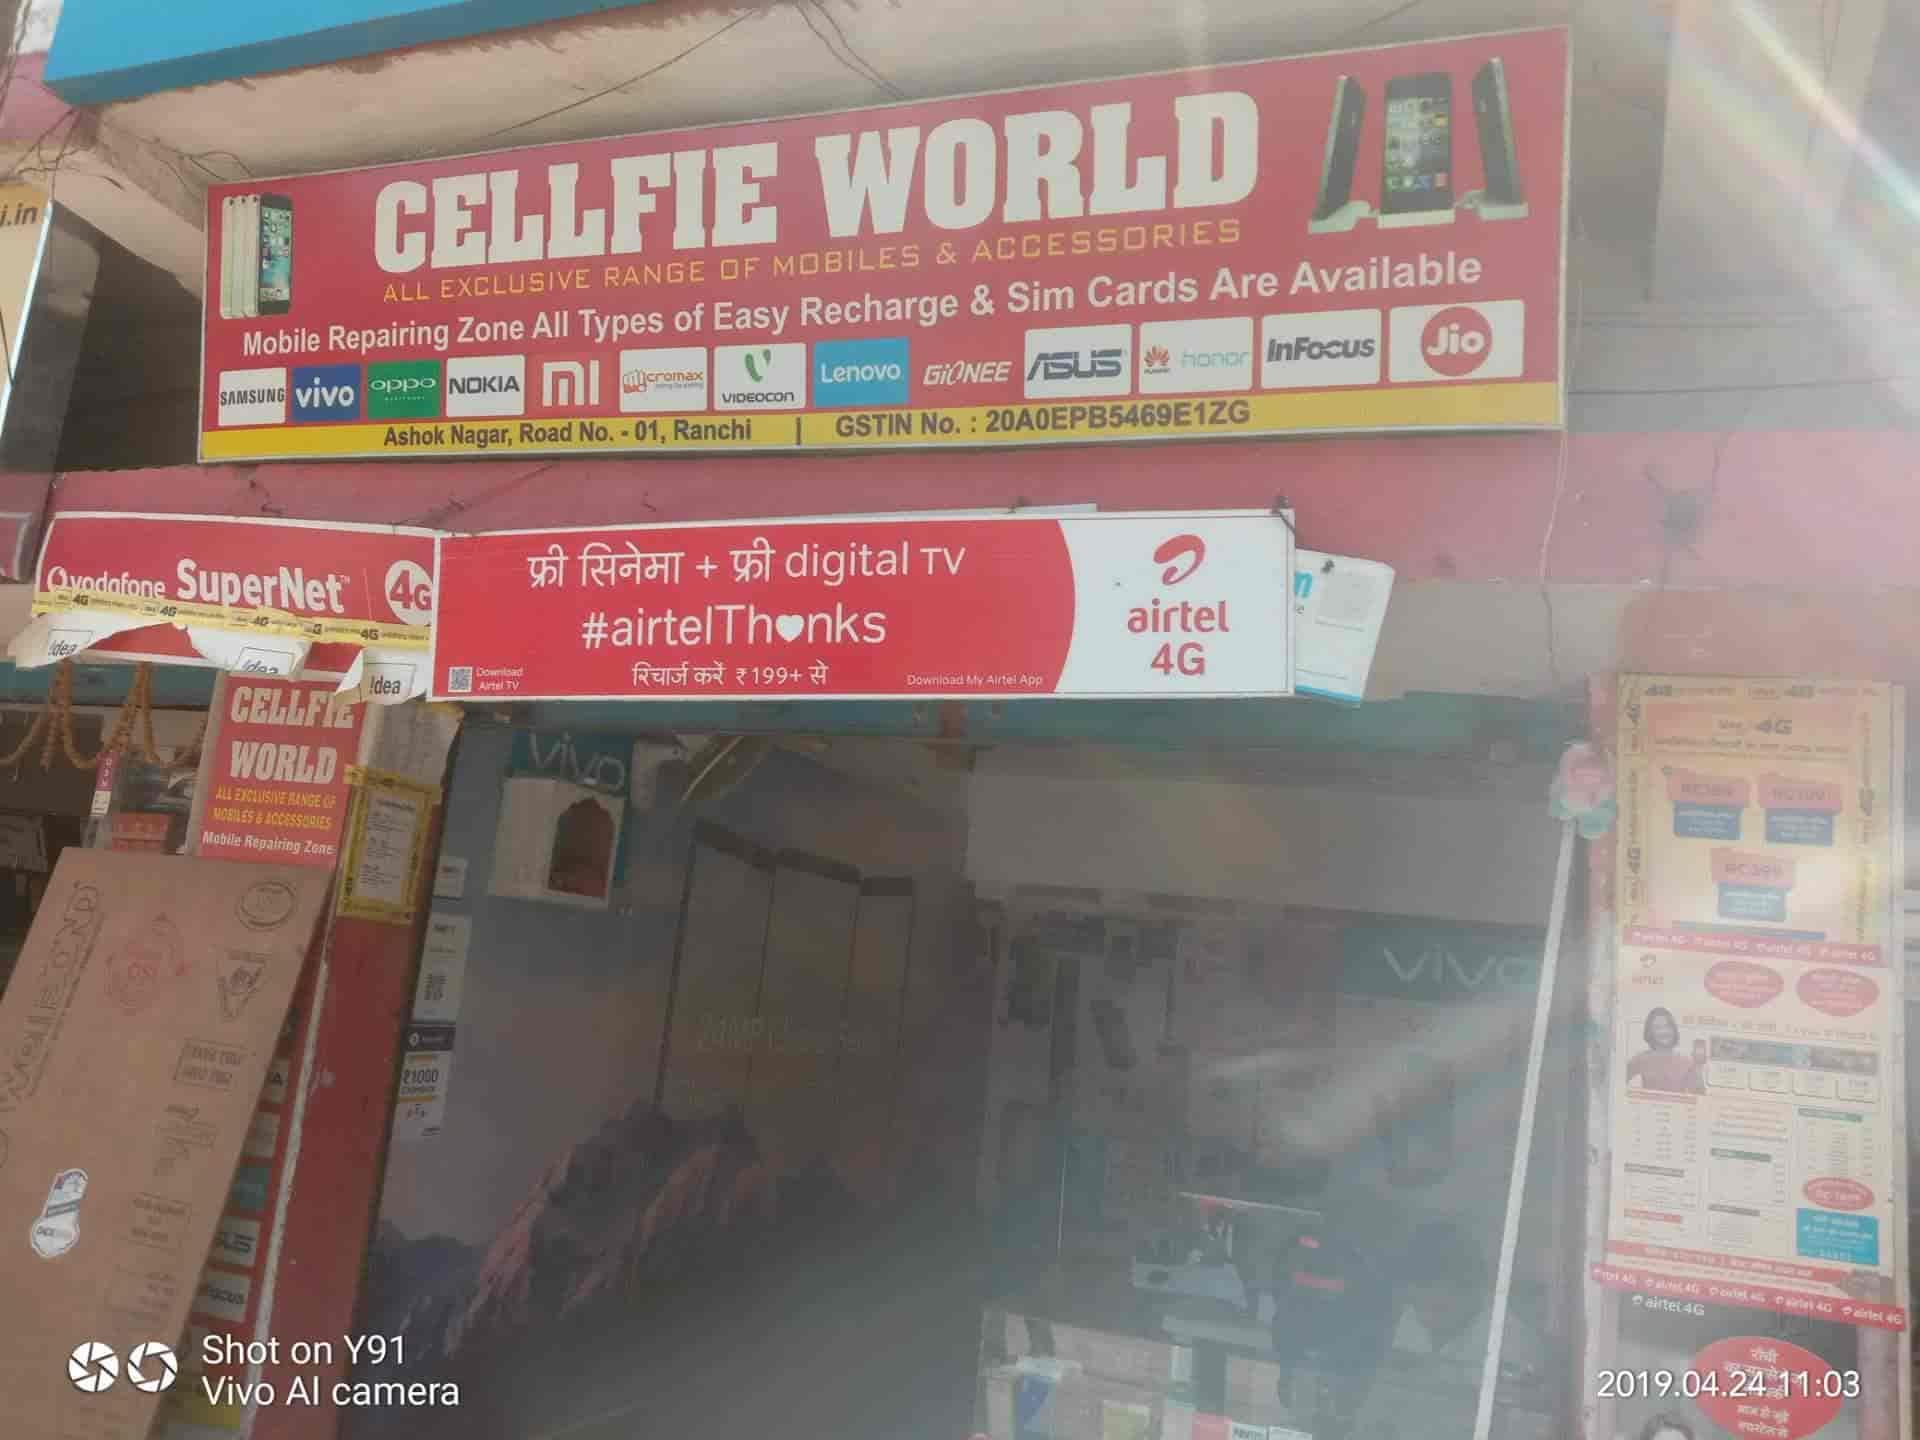 Cellfie World Photos, Ashok Nagar, Ranchi- Pictures & Images